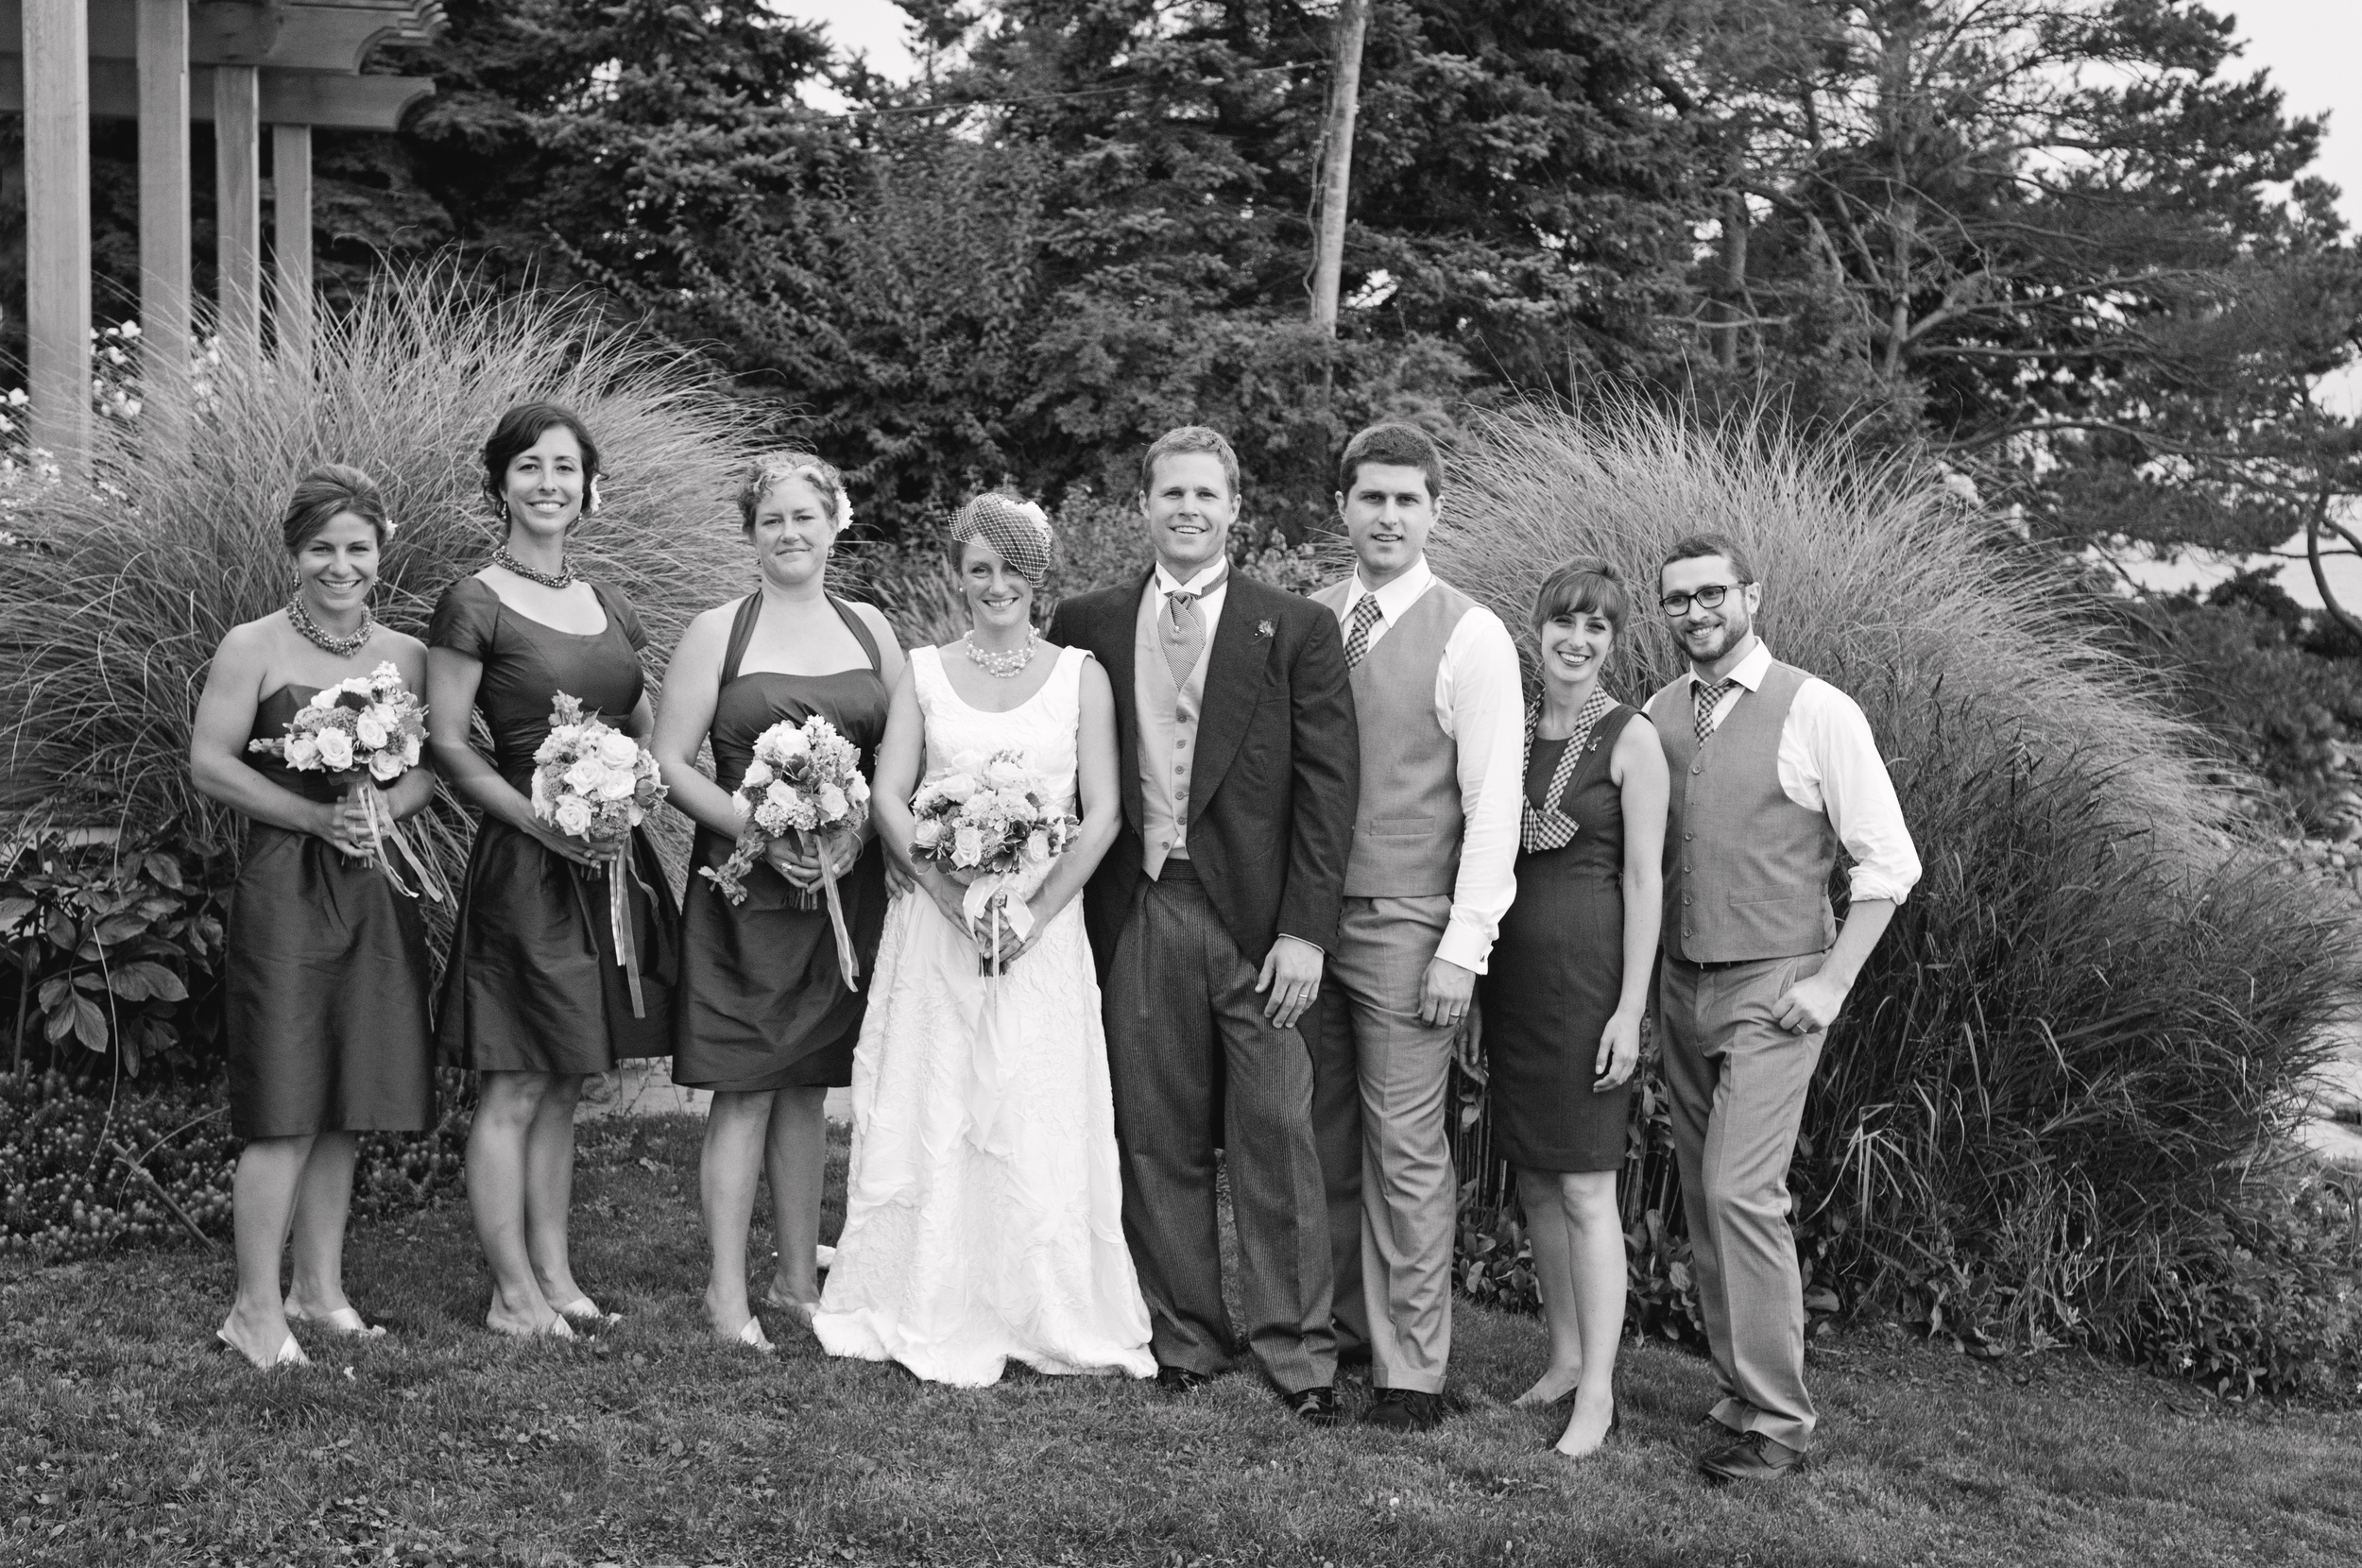 Angela_Chicoski_CT_wedding_photographer_089.jpg